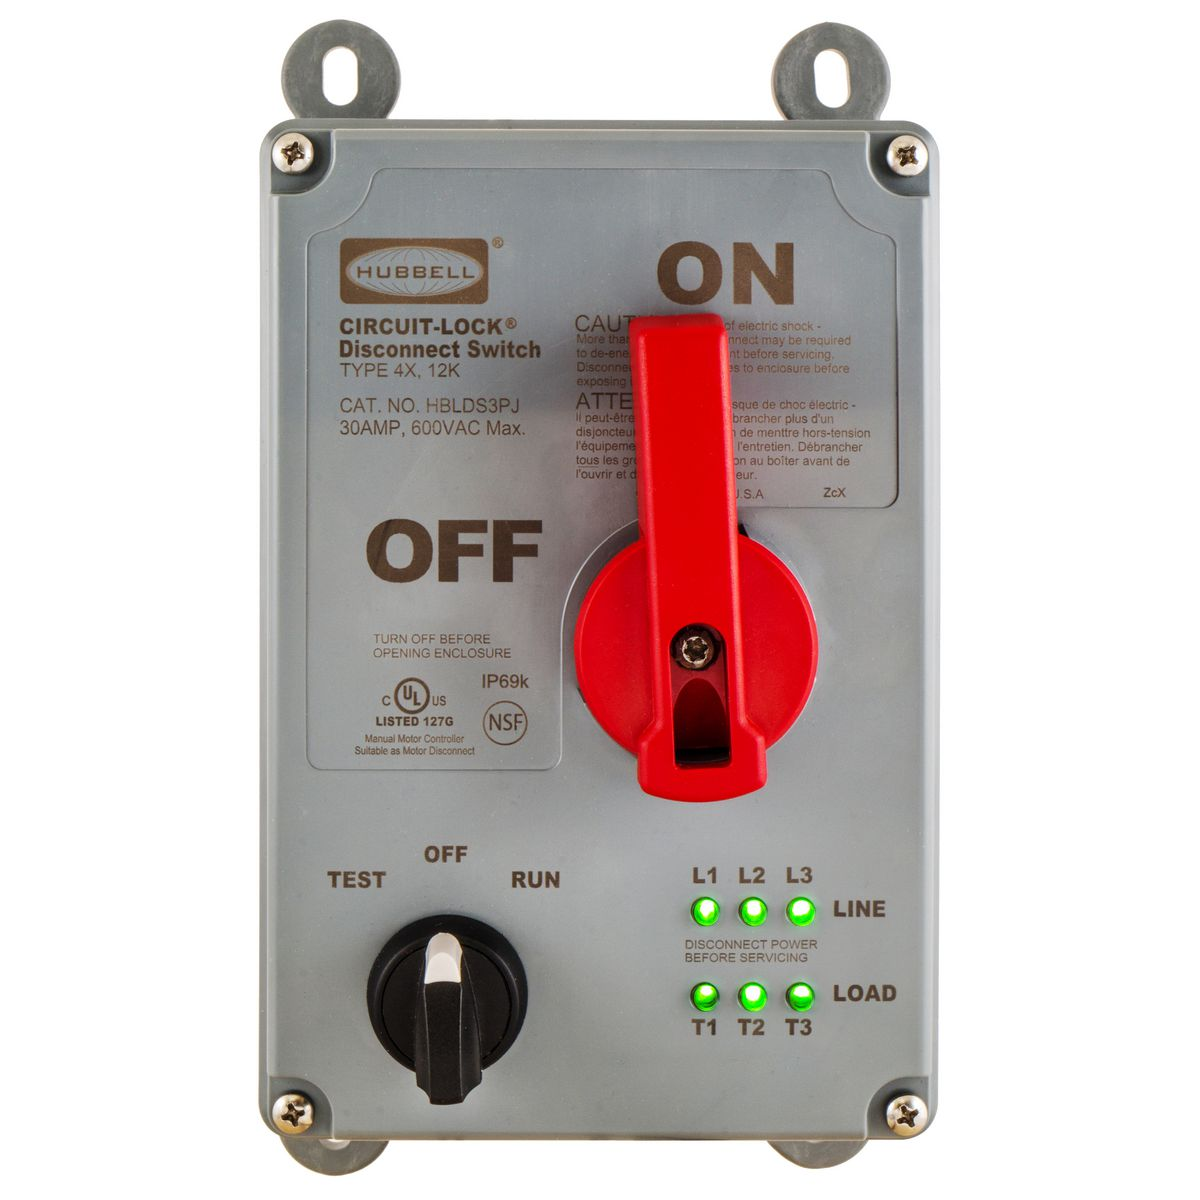 Hblds3pj Brand Wiring Device Kellems